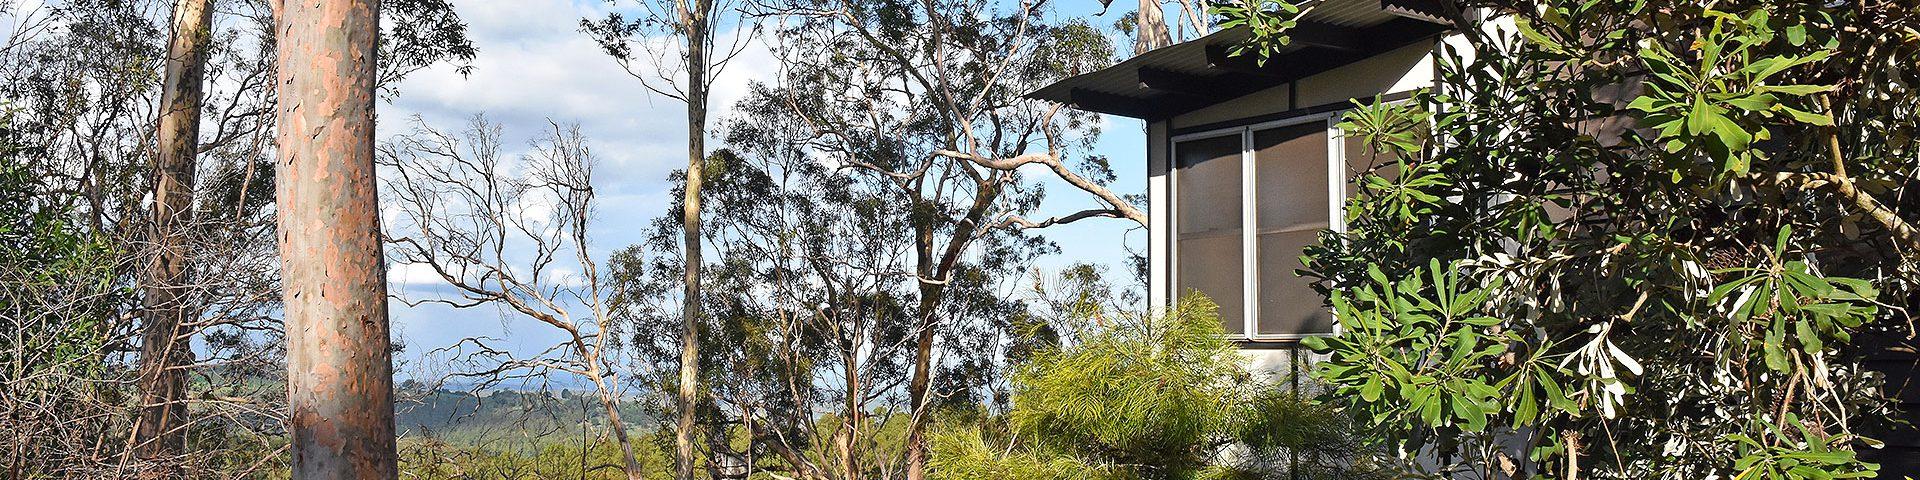 your treetop retreat awaits